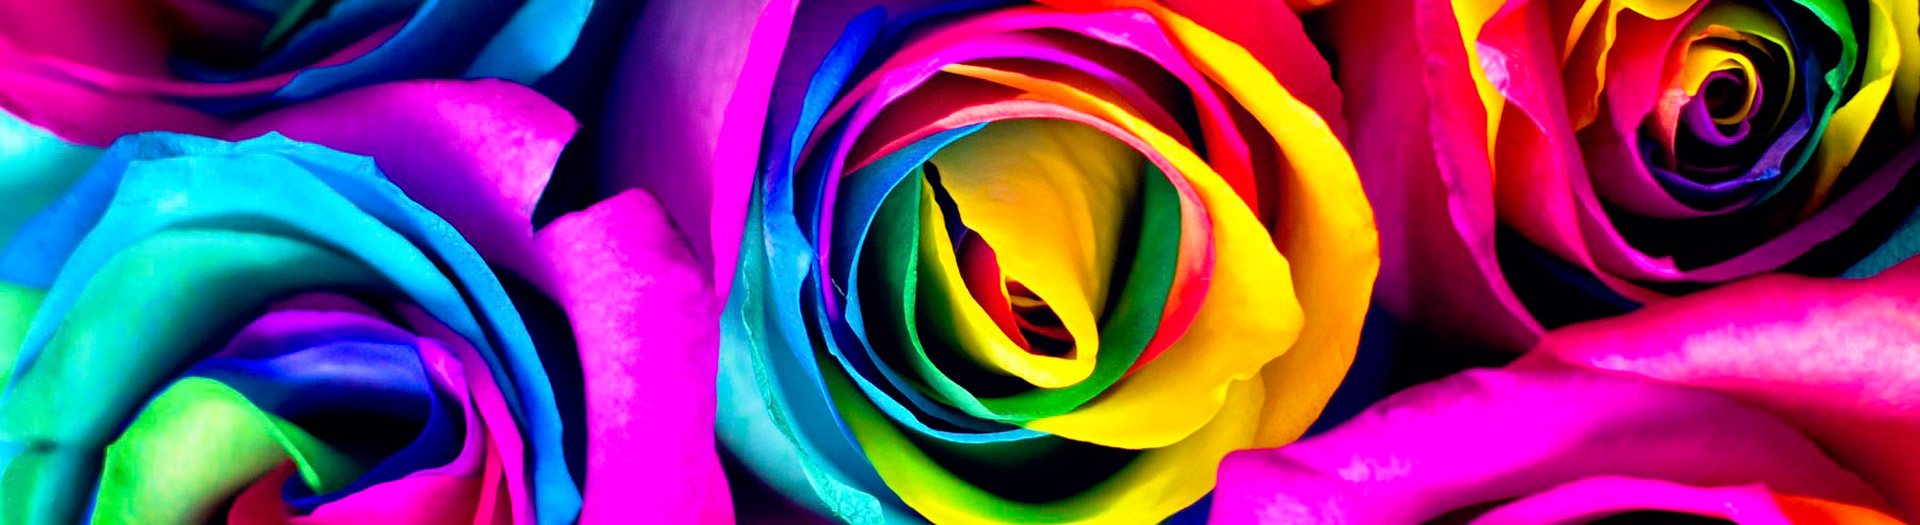 rosas tinturadas